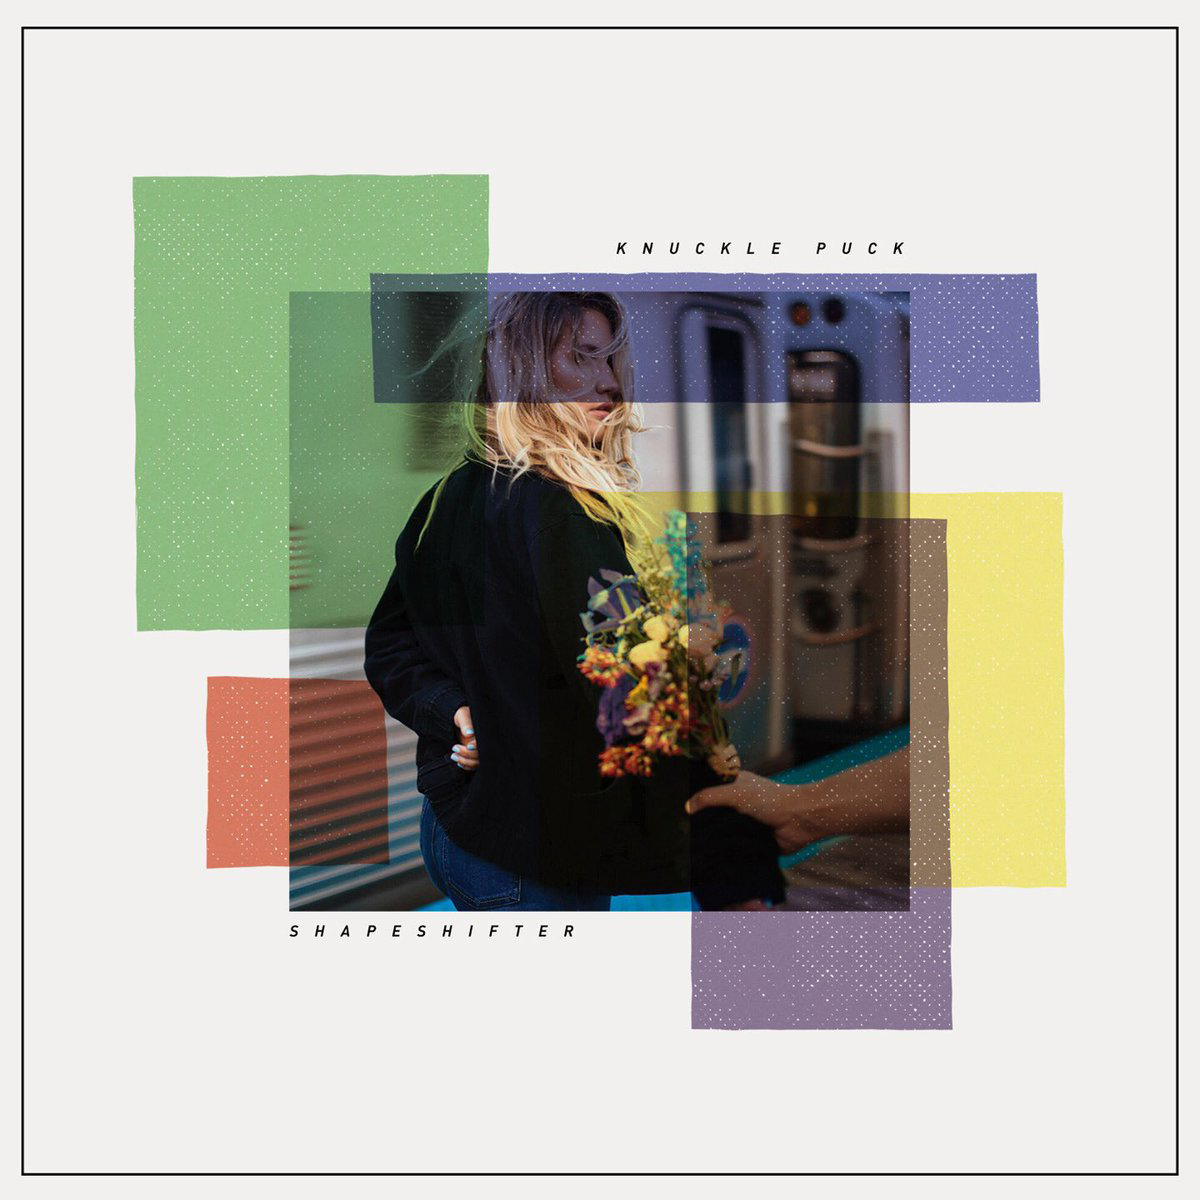 knuckle puck album download free